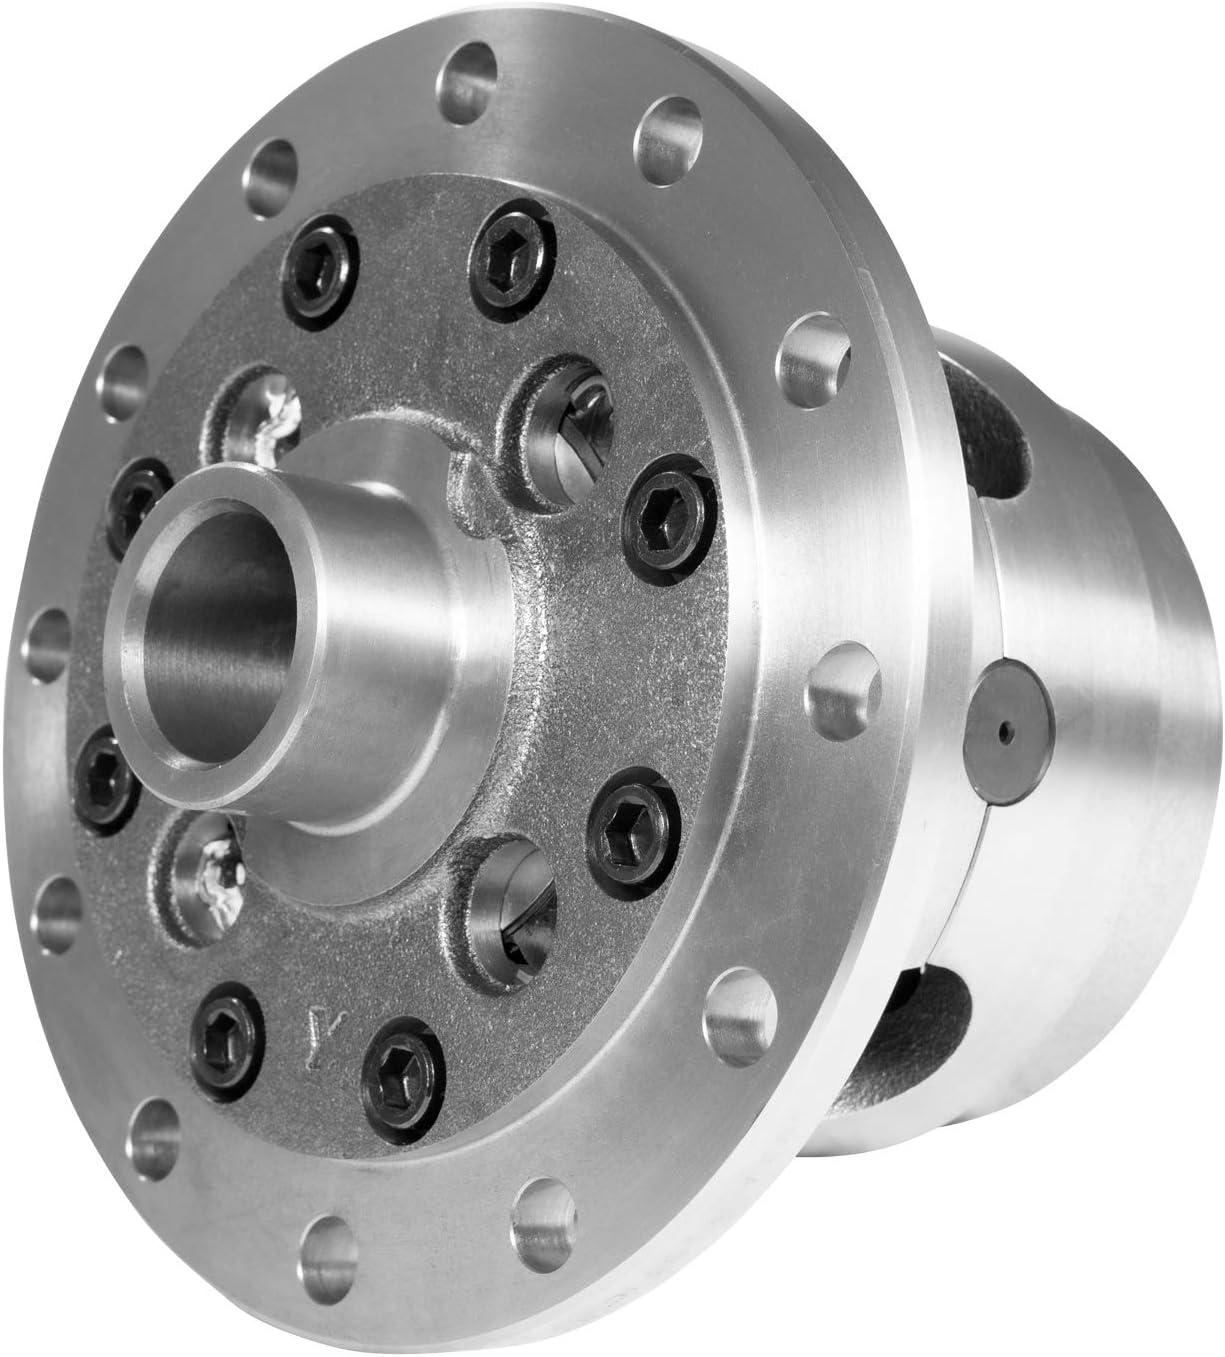 35 Spl Posi 4.375 Install Kit 11.25 Dana 80 Thin 3.73 Rear Ring /& Pinion